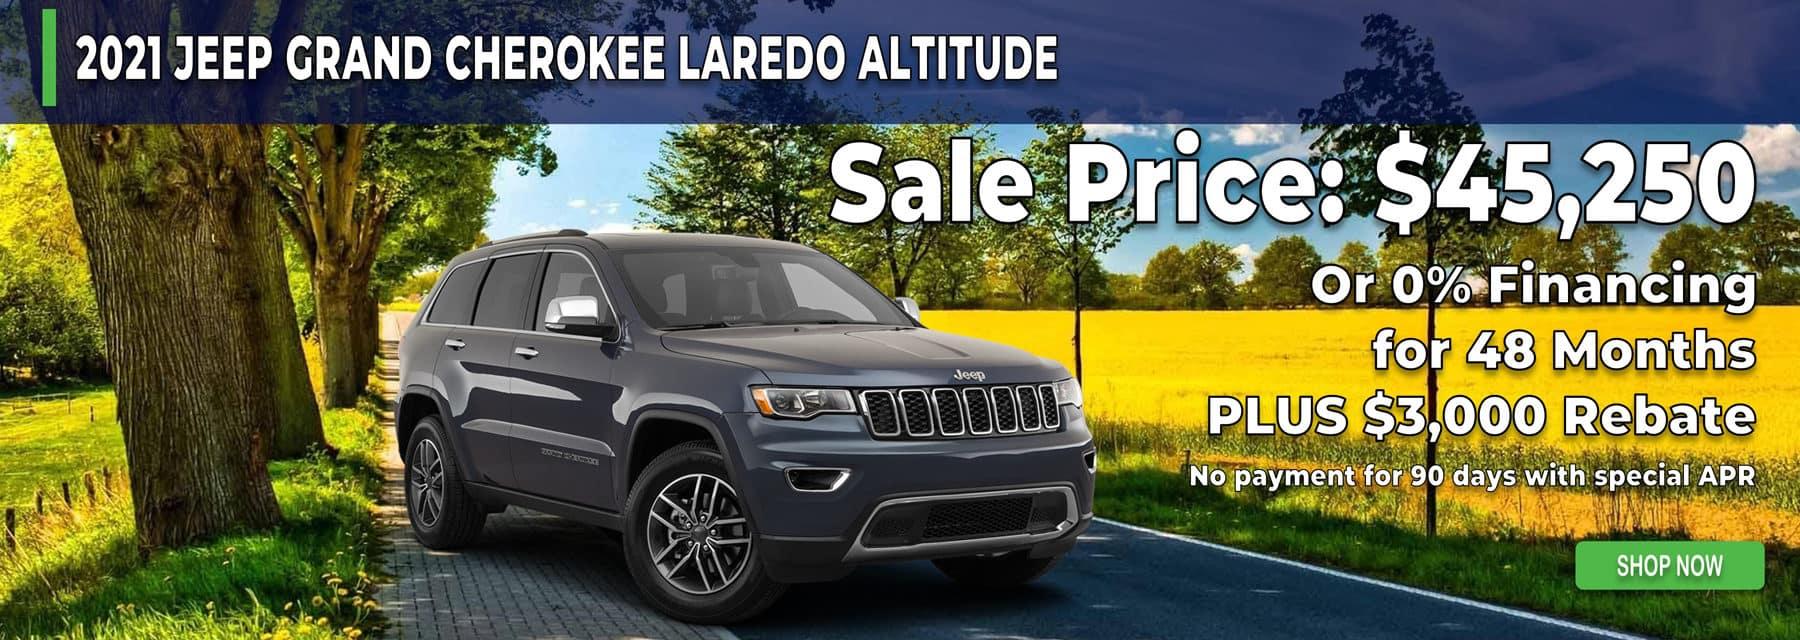 2021 Jeep Grand Cherokee on sale in Mukwonago Wisconsin